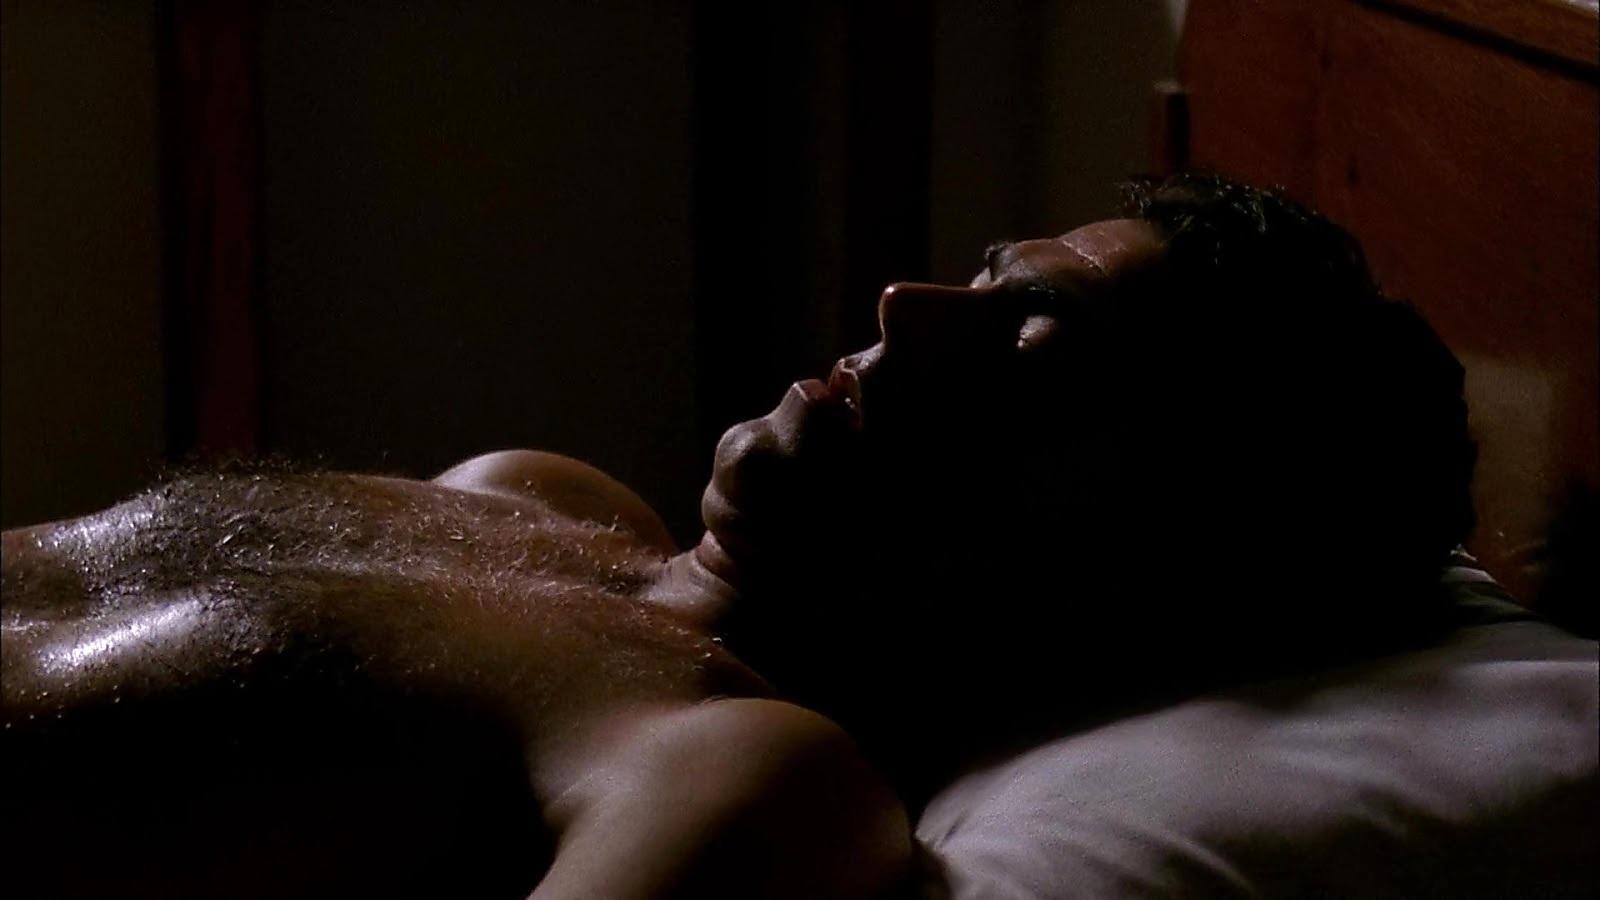 Eduardo Moscovis sexy shirtless scene August 1, 2020, 10am